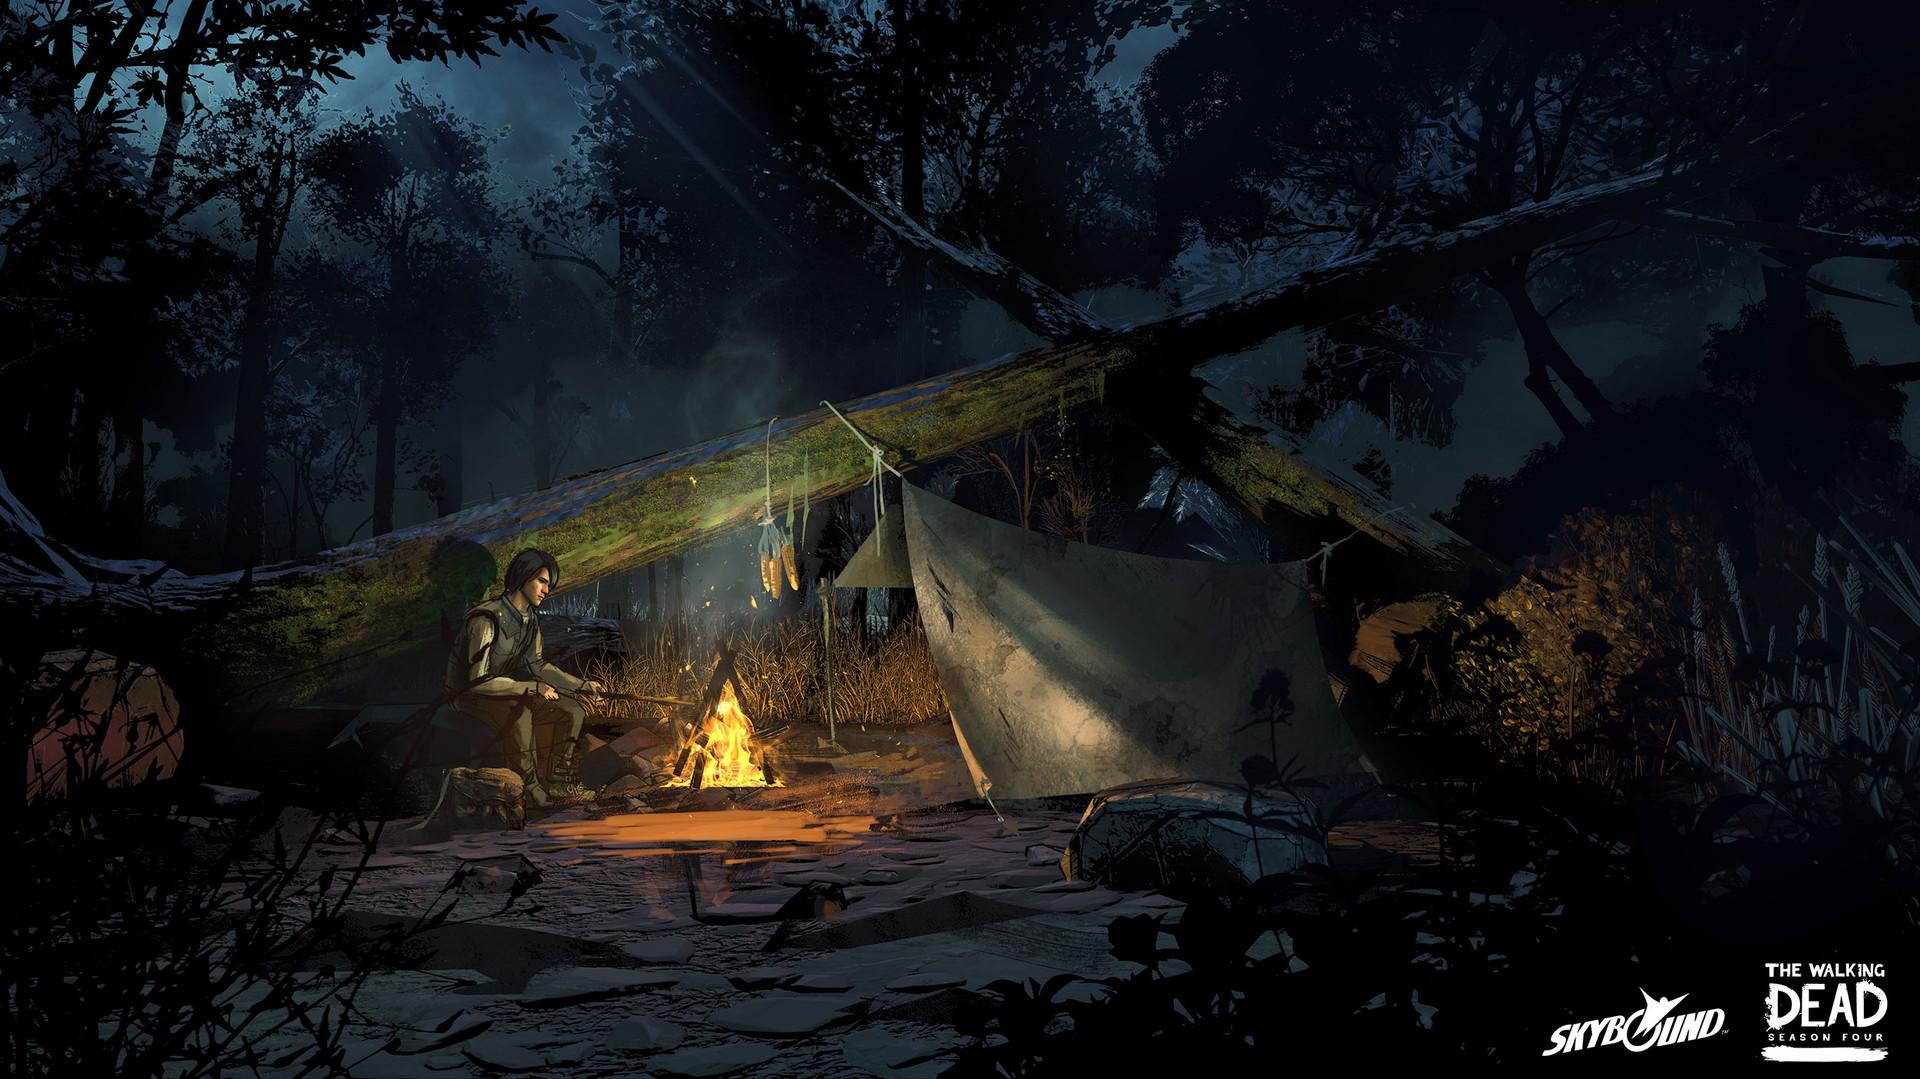 joyce-zhuosi-xu-env-forestcamp.jpg